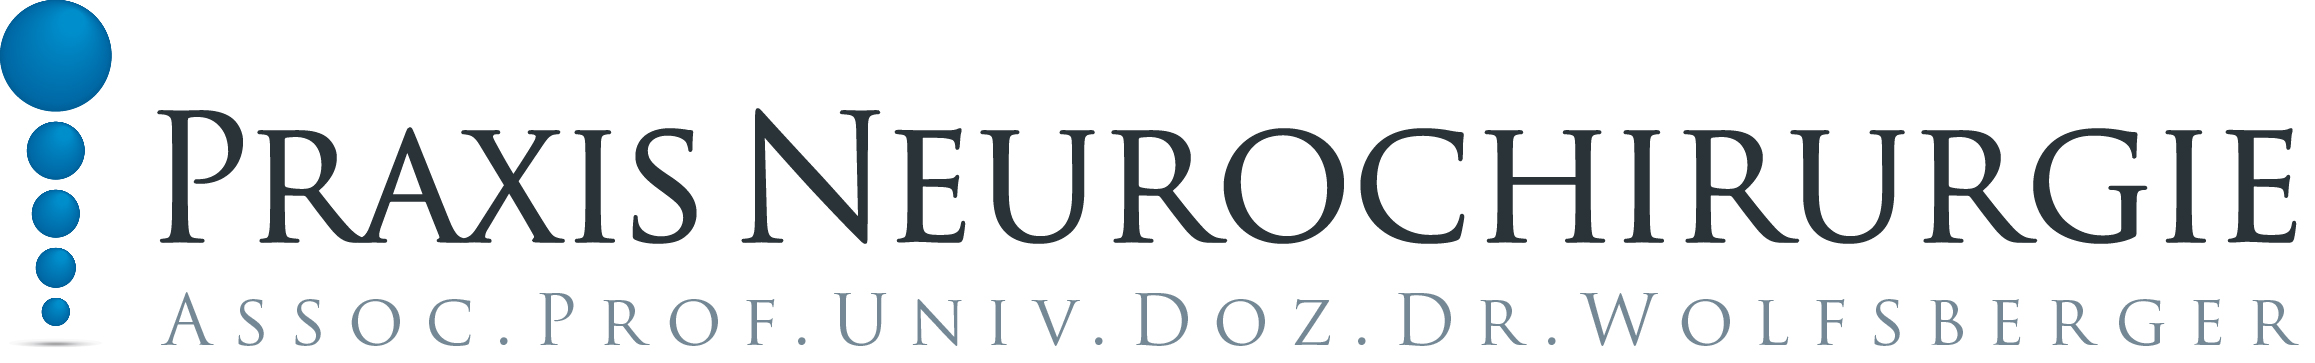 Praxis Neurochirurgie | Prof.Dr.Wolfsberger